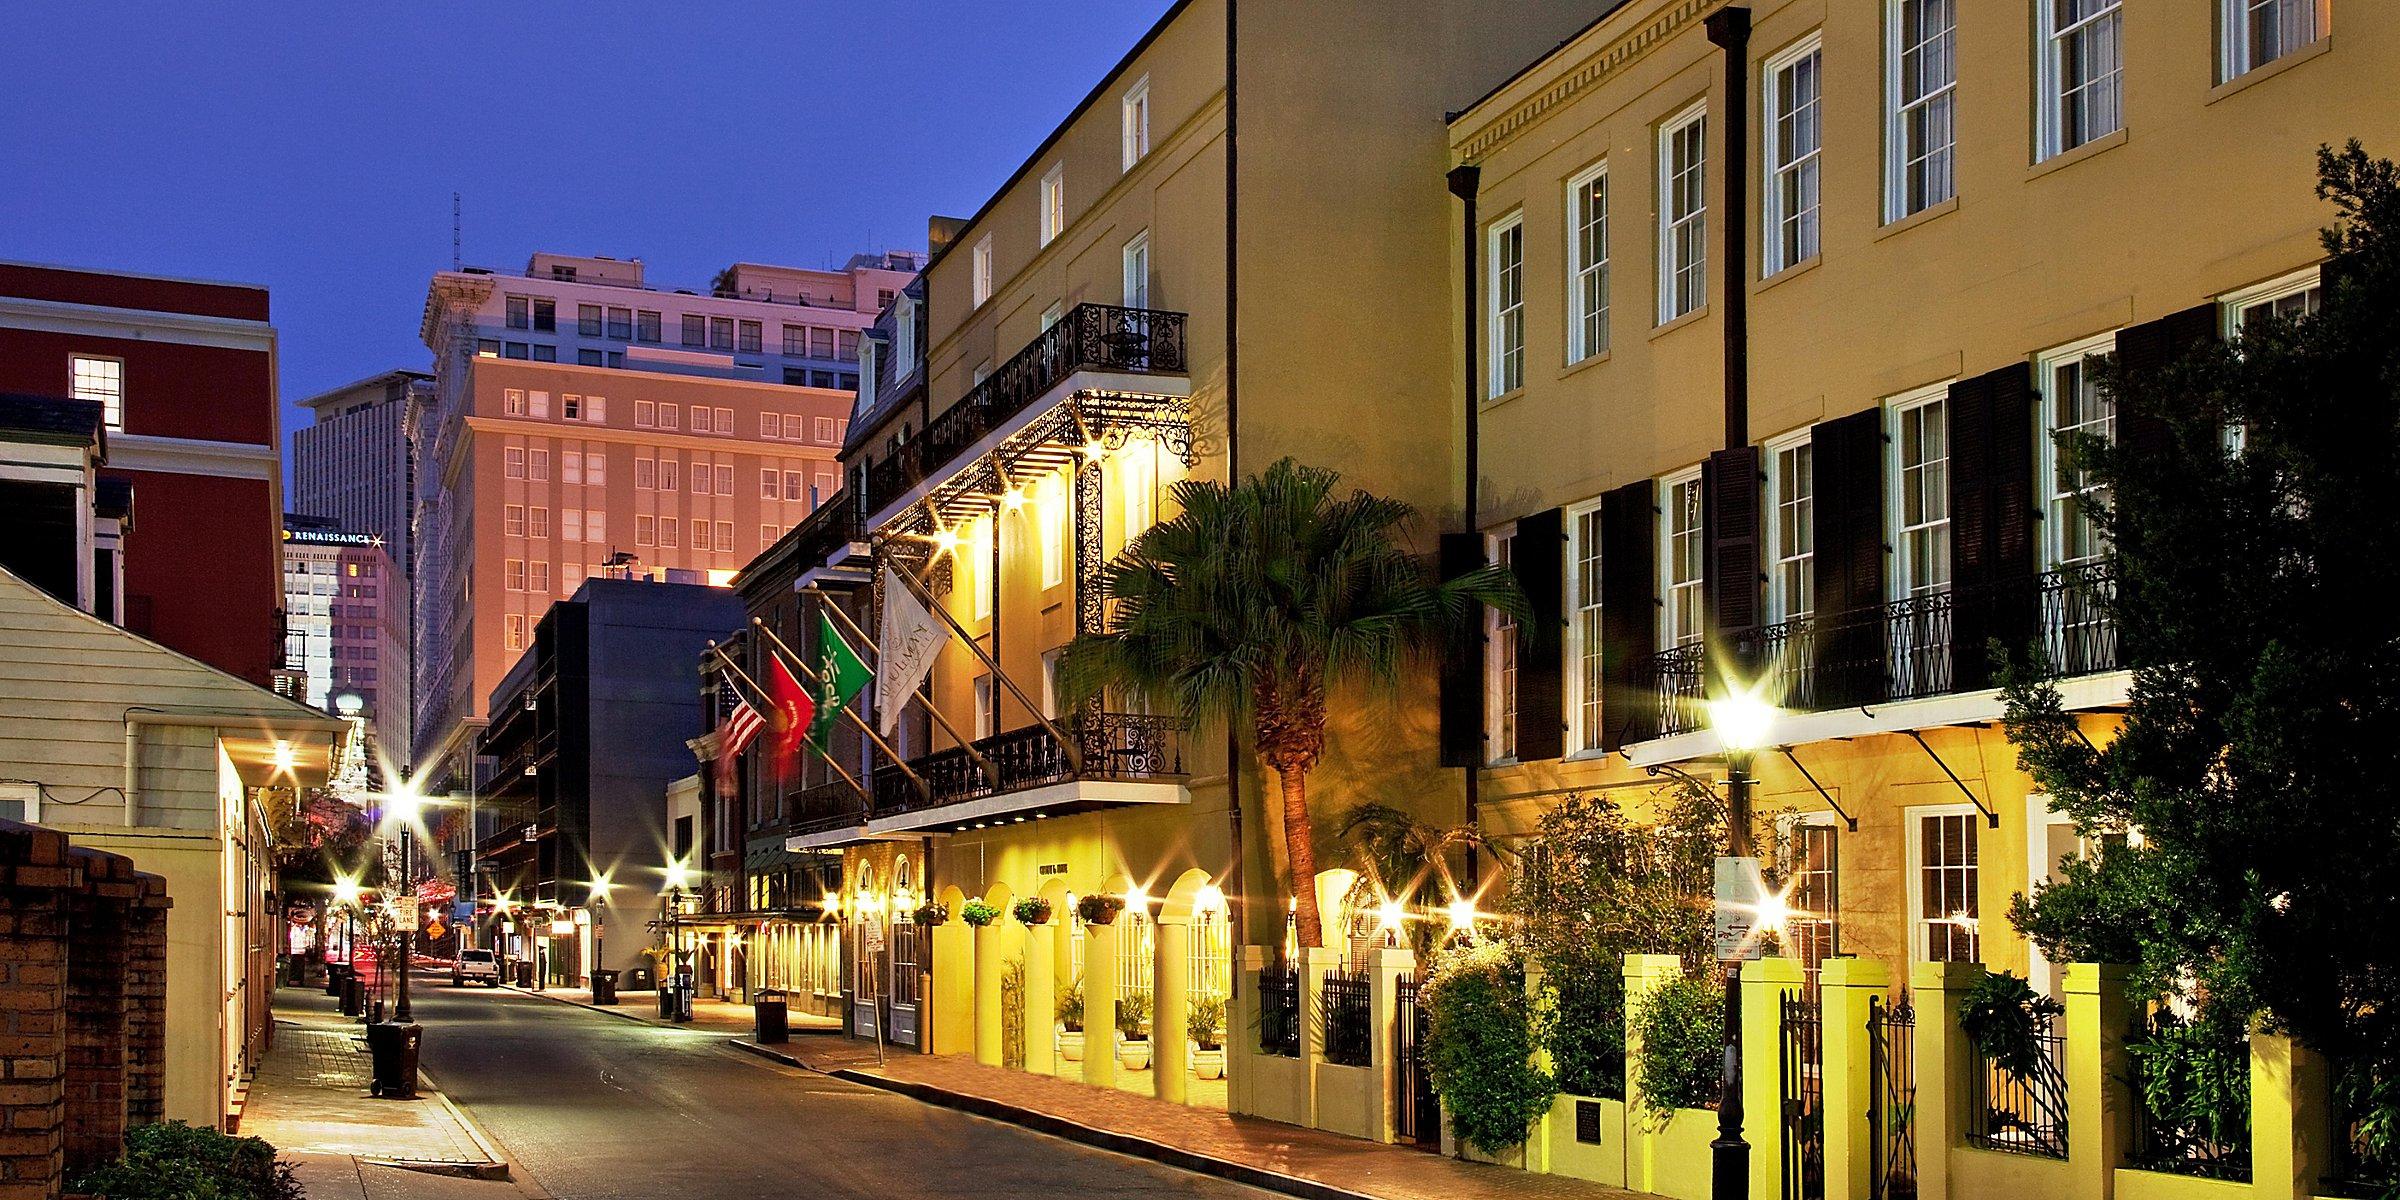 Hotels in French Quarter | Holiday Inn French Quarter-Chateau LeMoyne